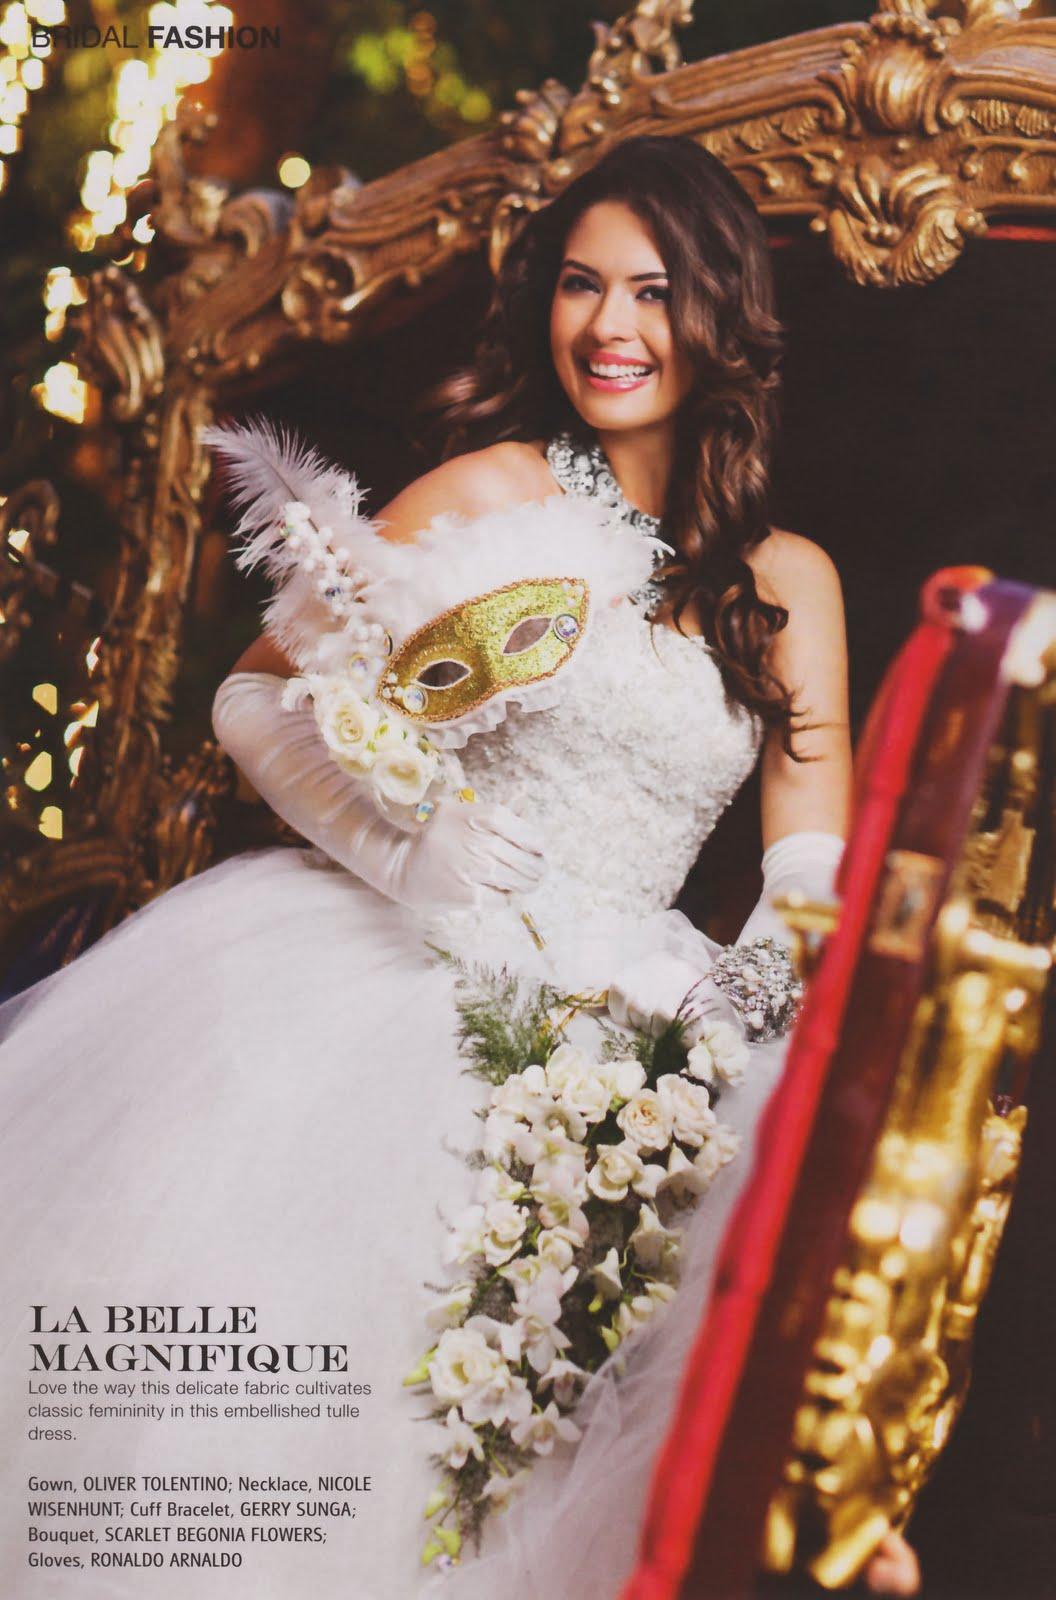 ⊰✿• .¸¸.⊰ Galeria de Priscilla Meirelles, Miss Earth 2004.⊰✿• .¸¸.⊰  - Página 3 Wedding%2BBelle%2B(Oct%2B2009)%2B5